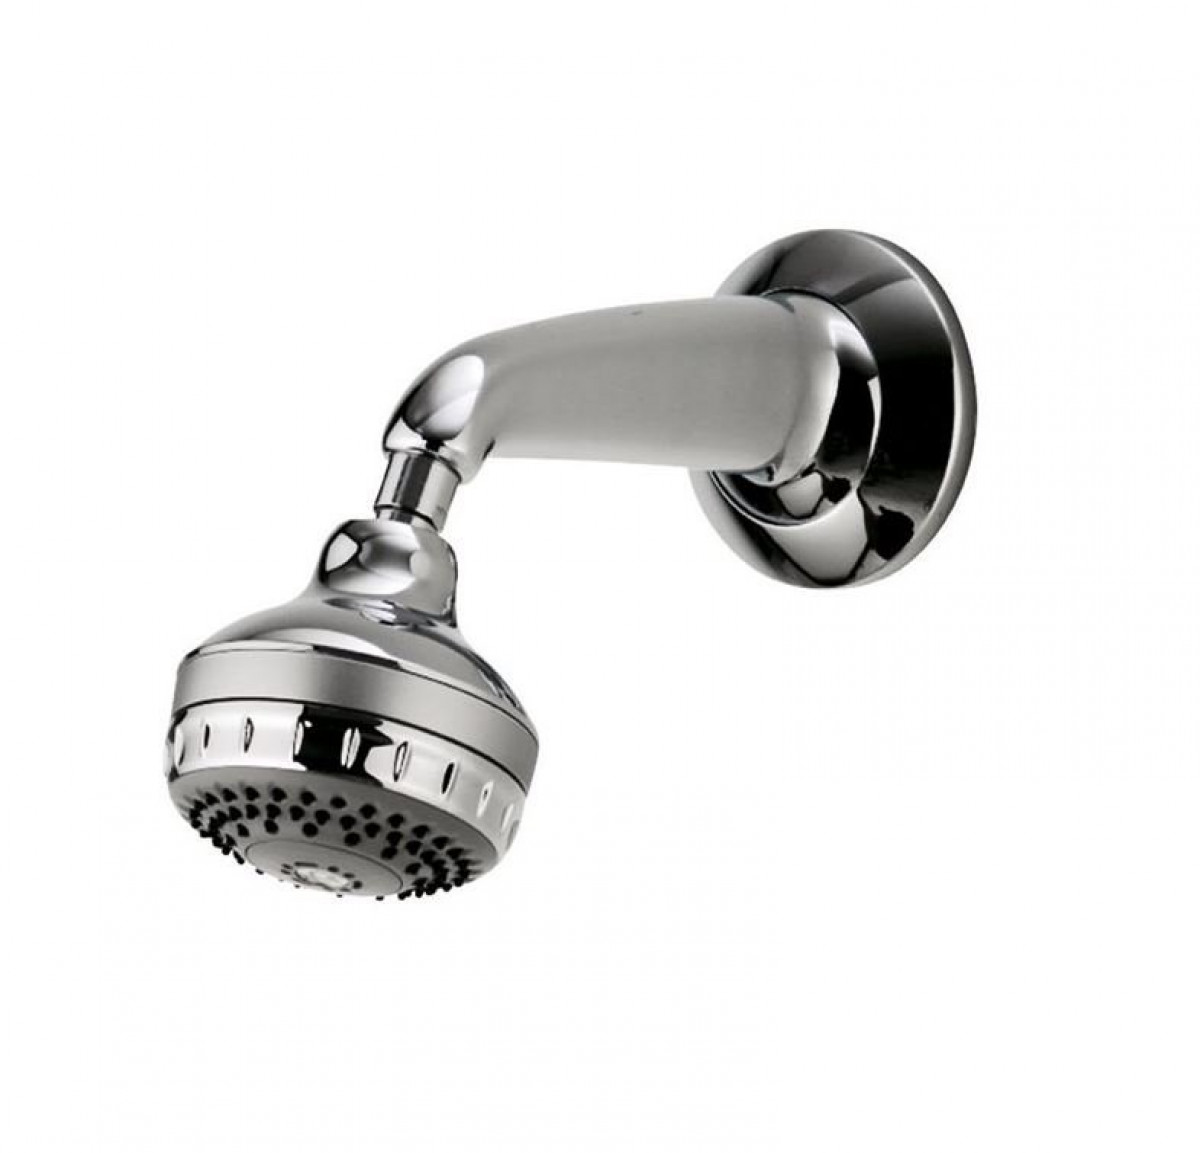 Aqualisa Aquamixa Thermo Bath Shower Mixer With Fixed Head